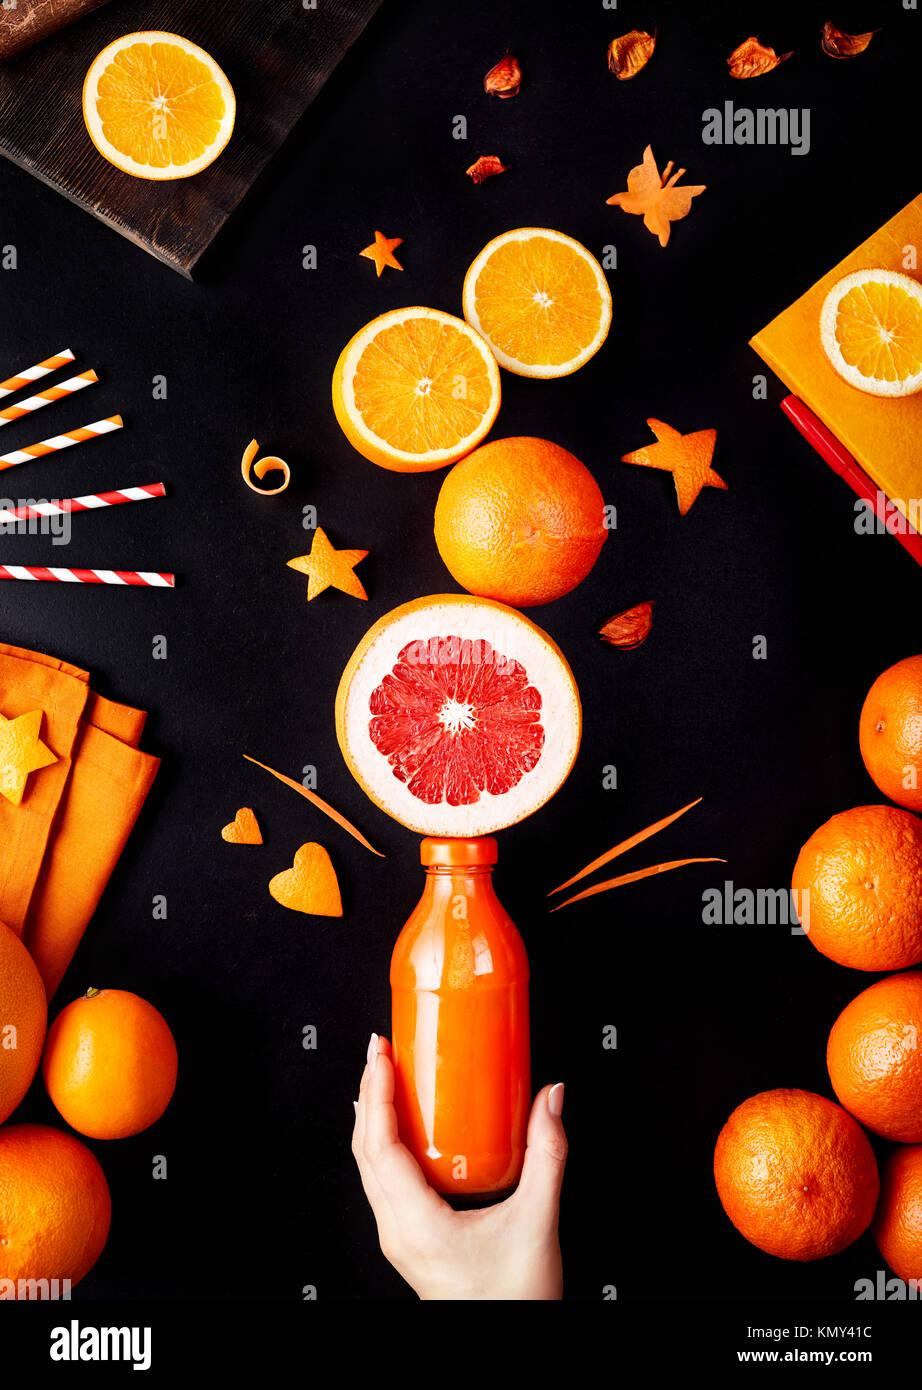 Detox zumo fresco de naranjas, toronjas y limón sobre fondo negro flay sentar Imagen De Stock